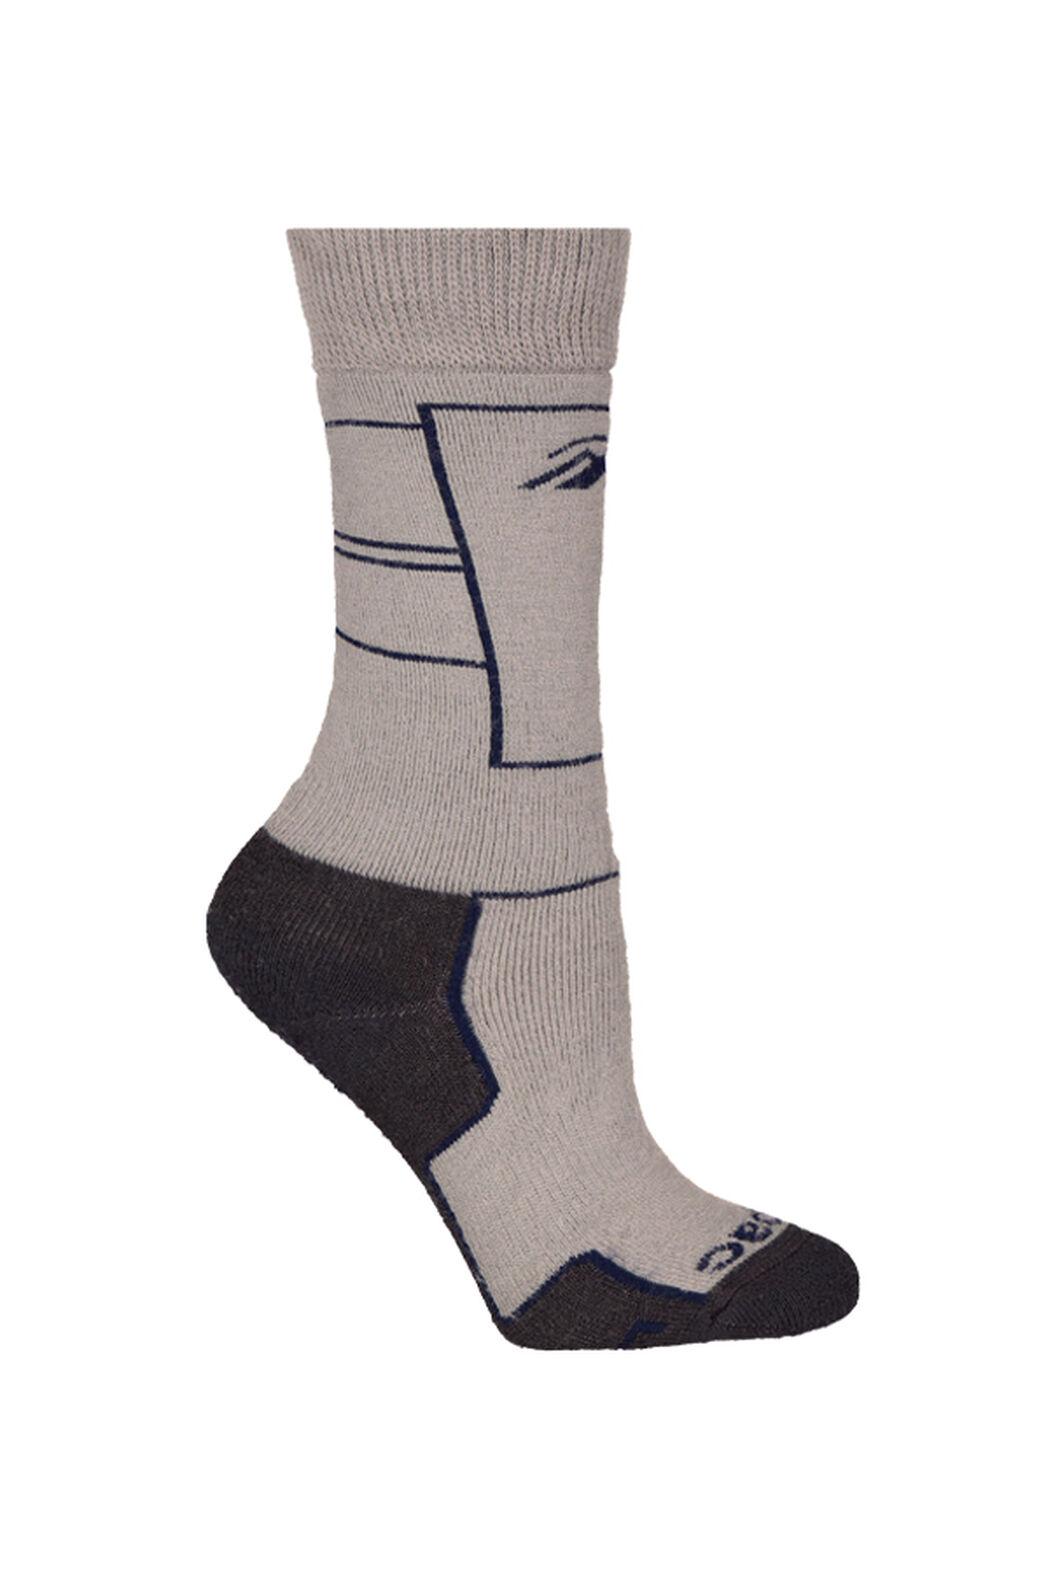 Ski Socks Kids', Black Iris/Alloy, hi-res